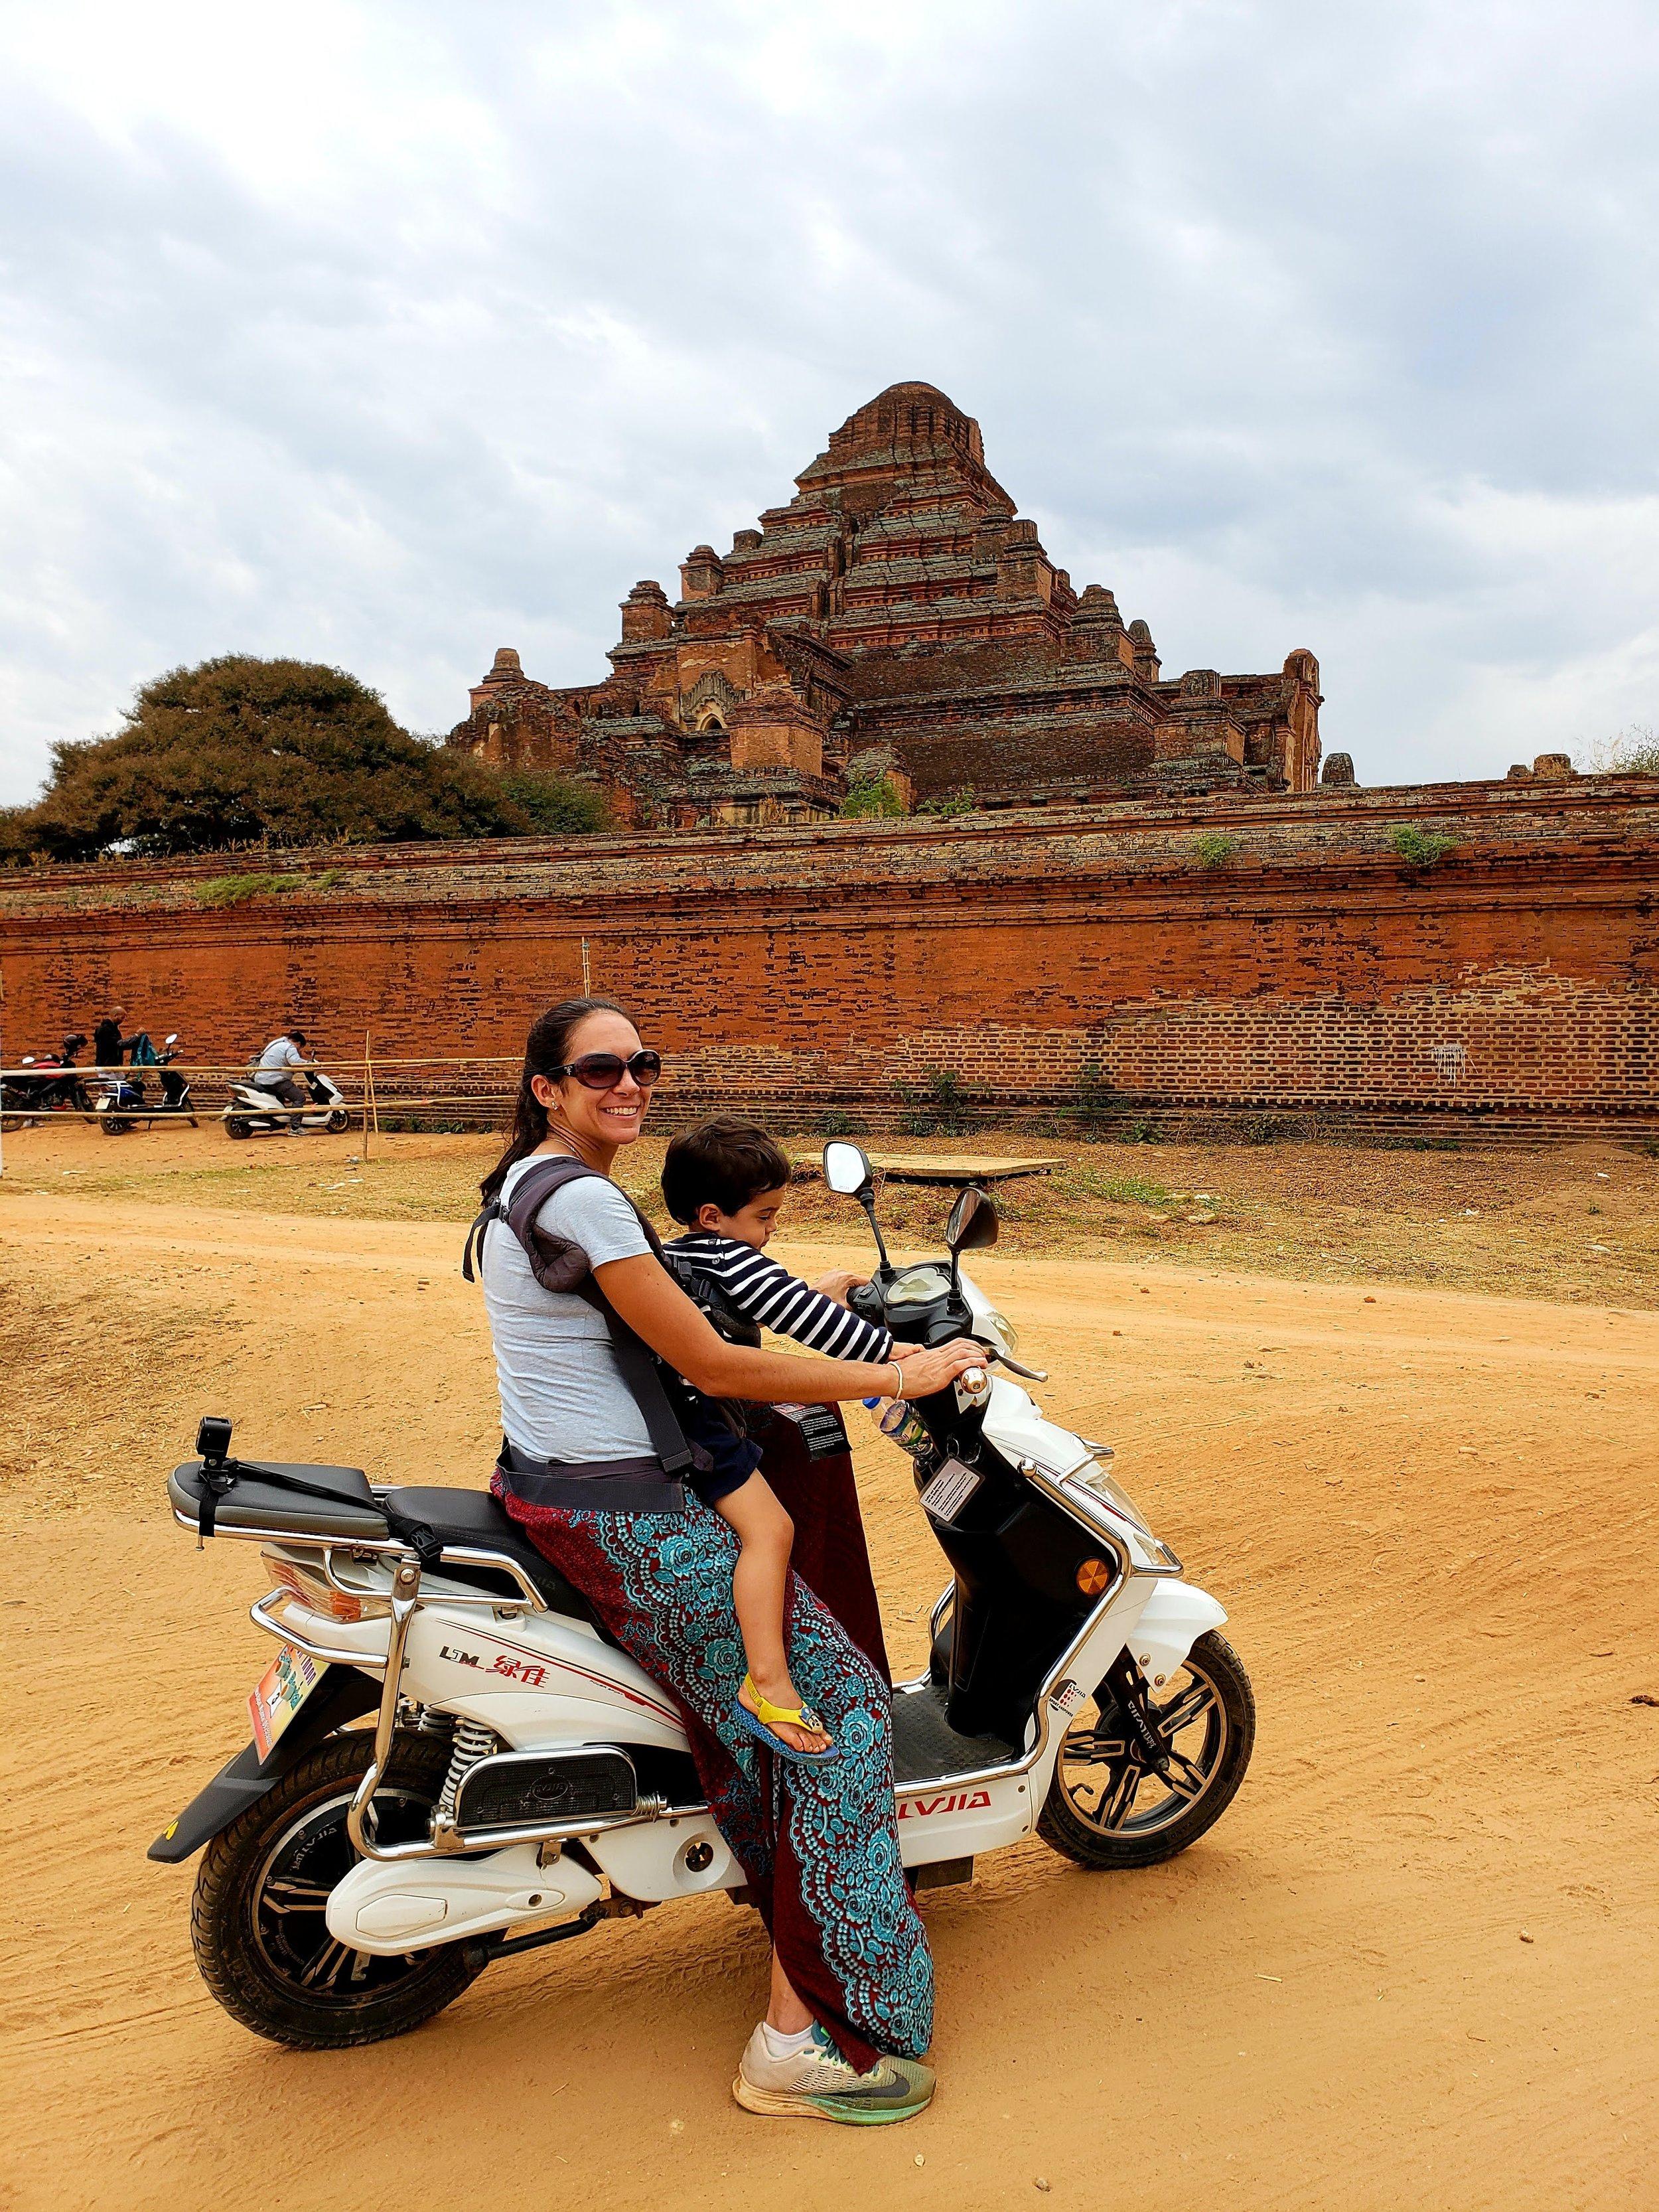 Nossa e-baike no Templo Dhammayangyi